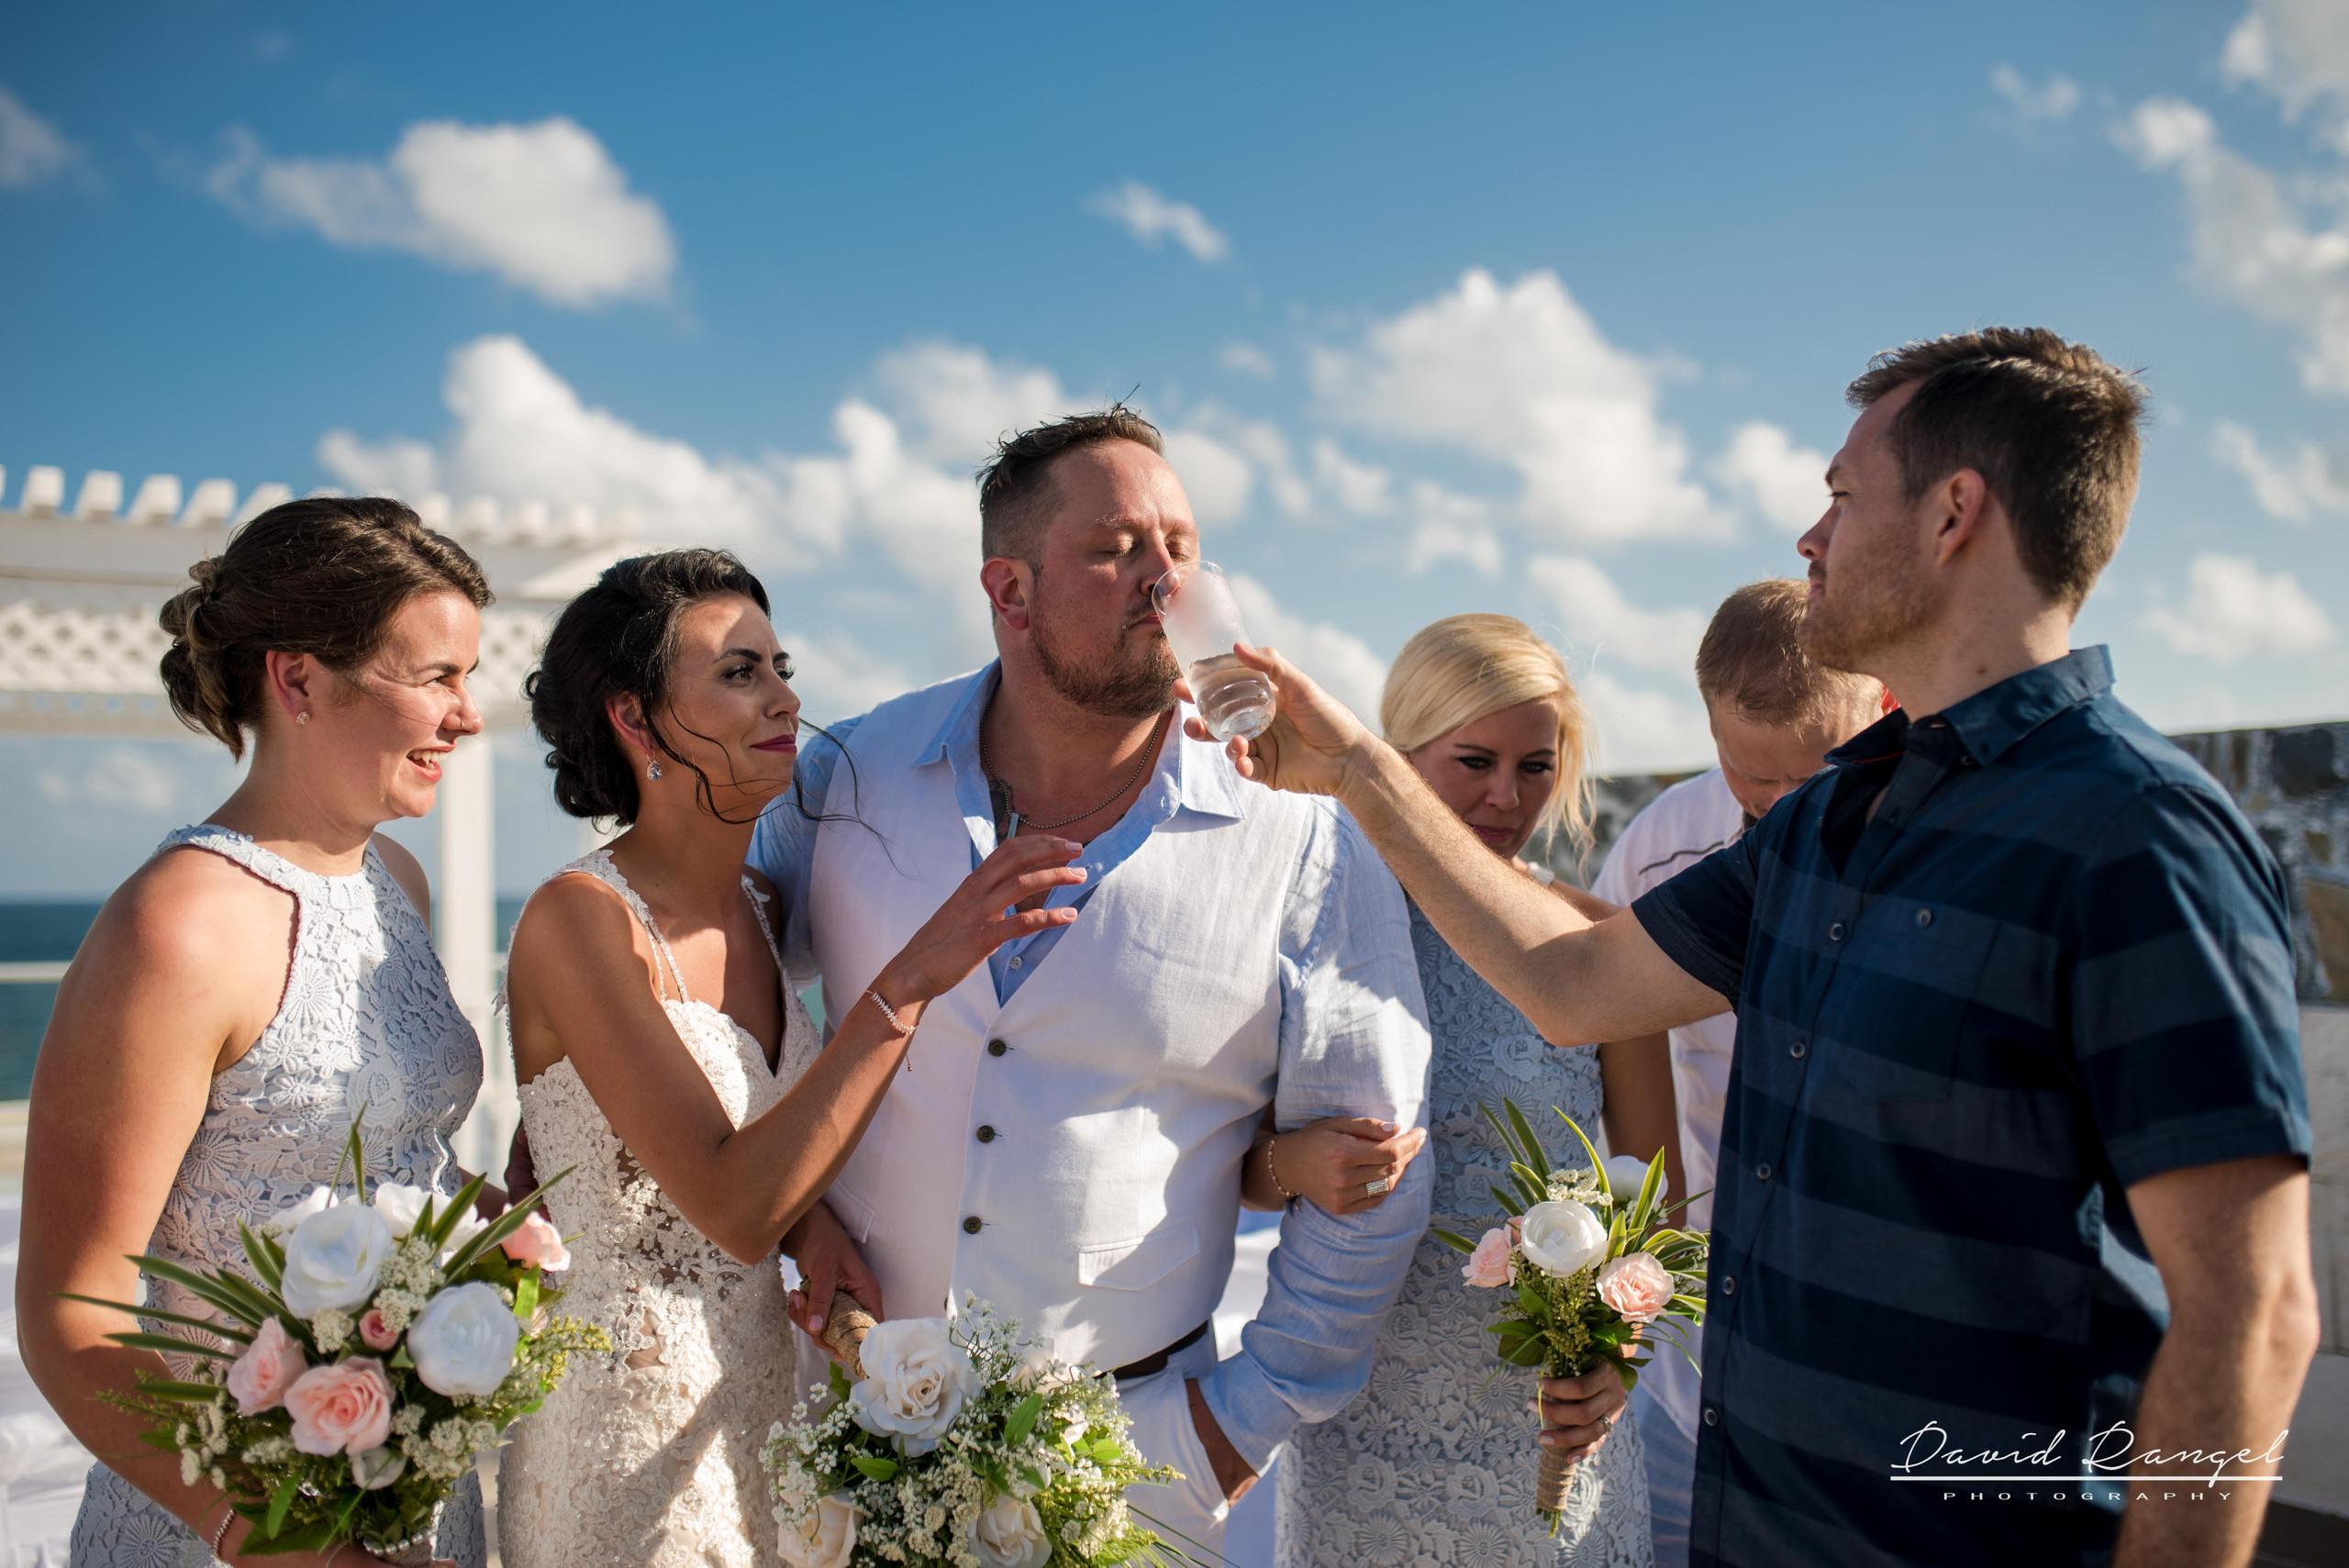 groom+sky+deck+guest+wedding+drink+photo